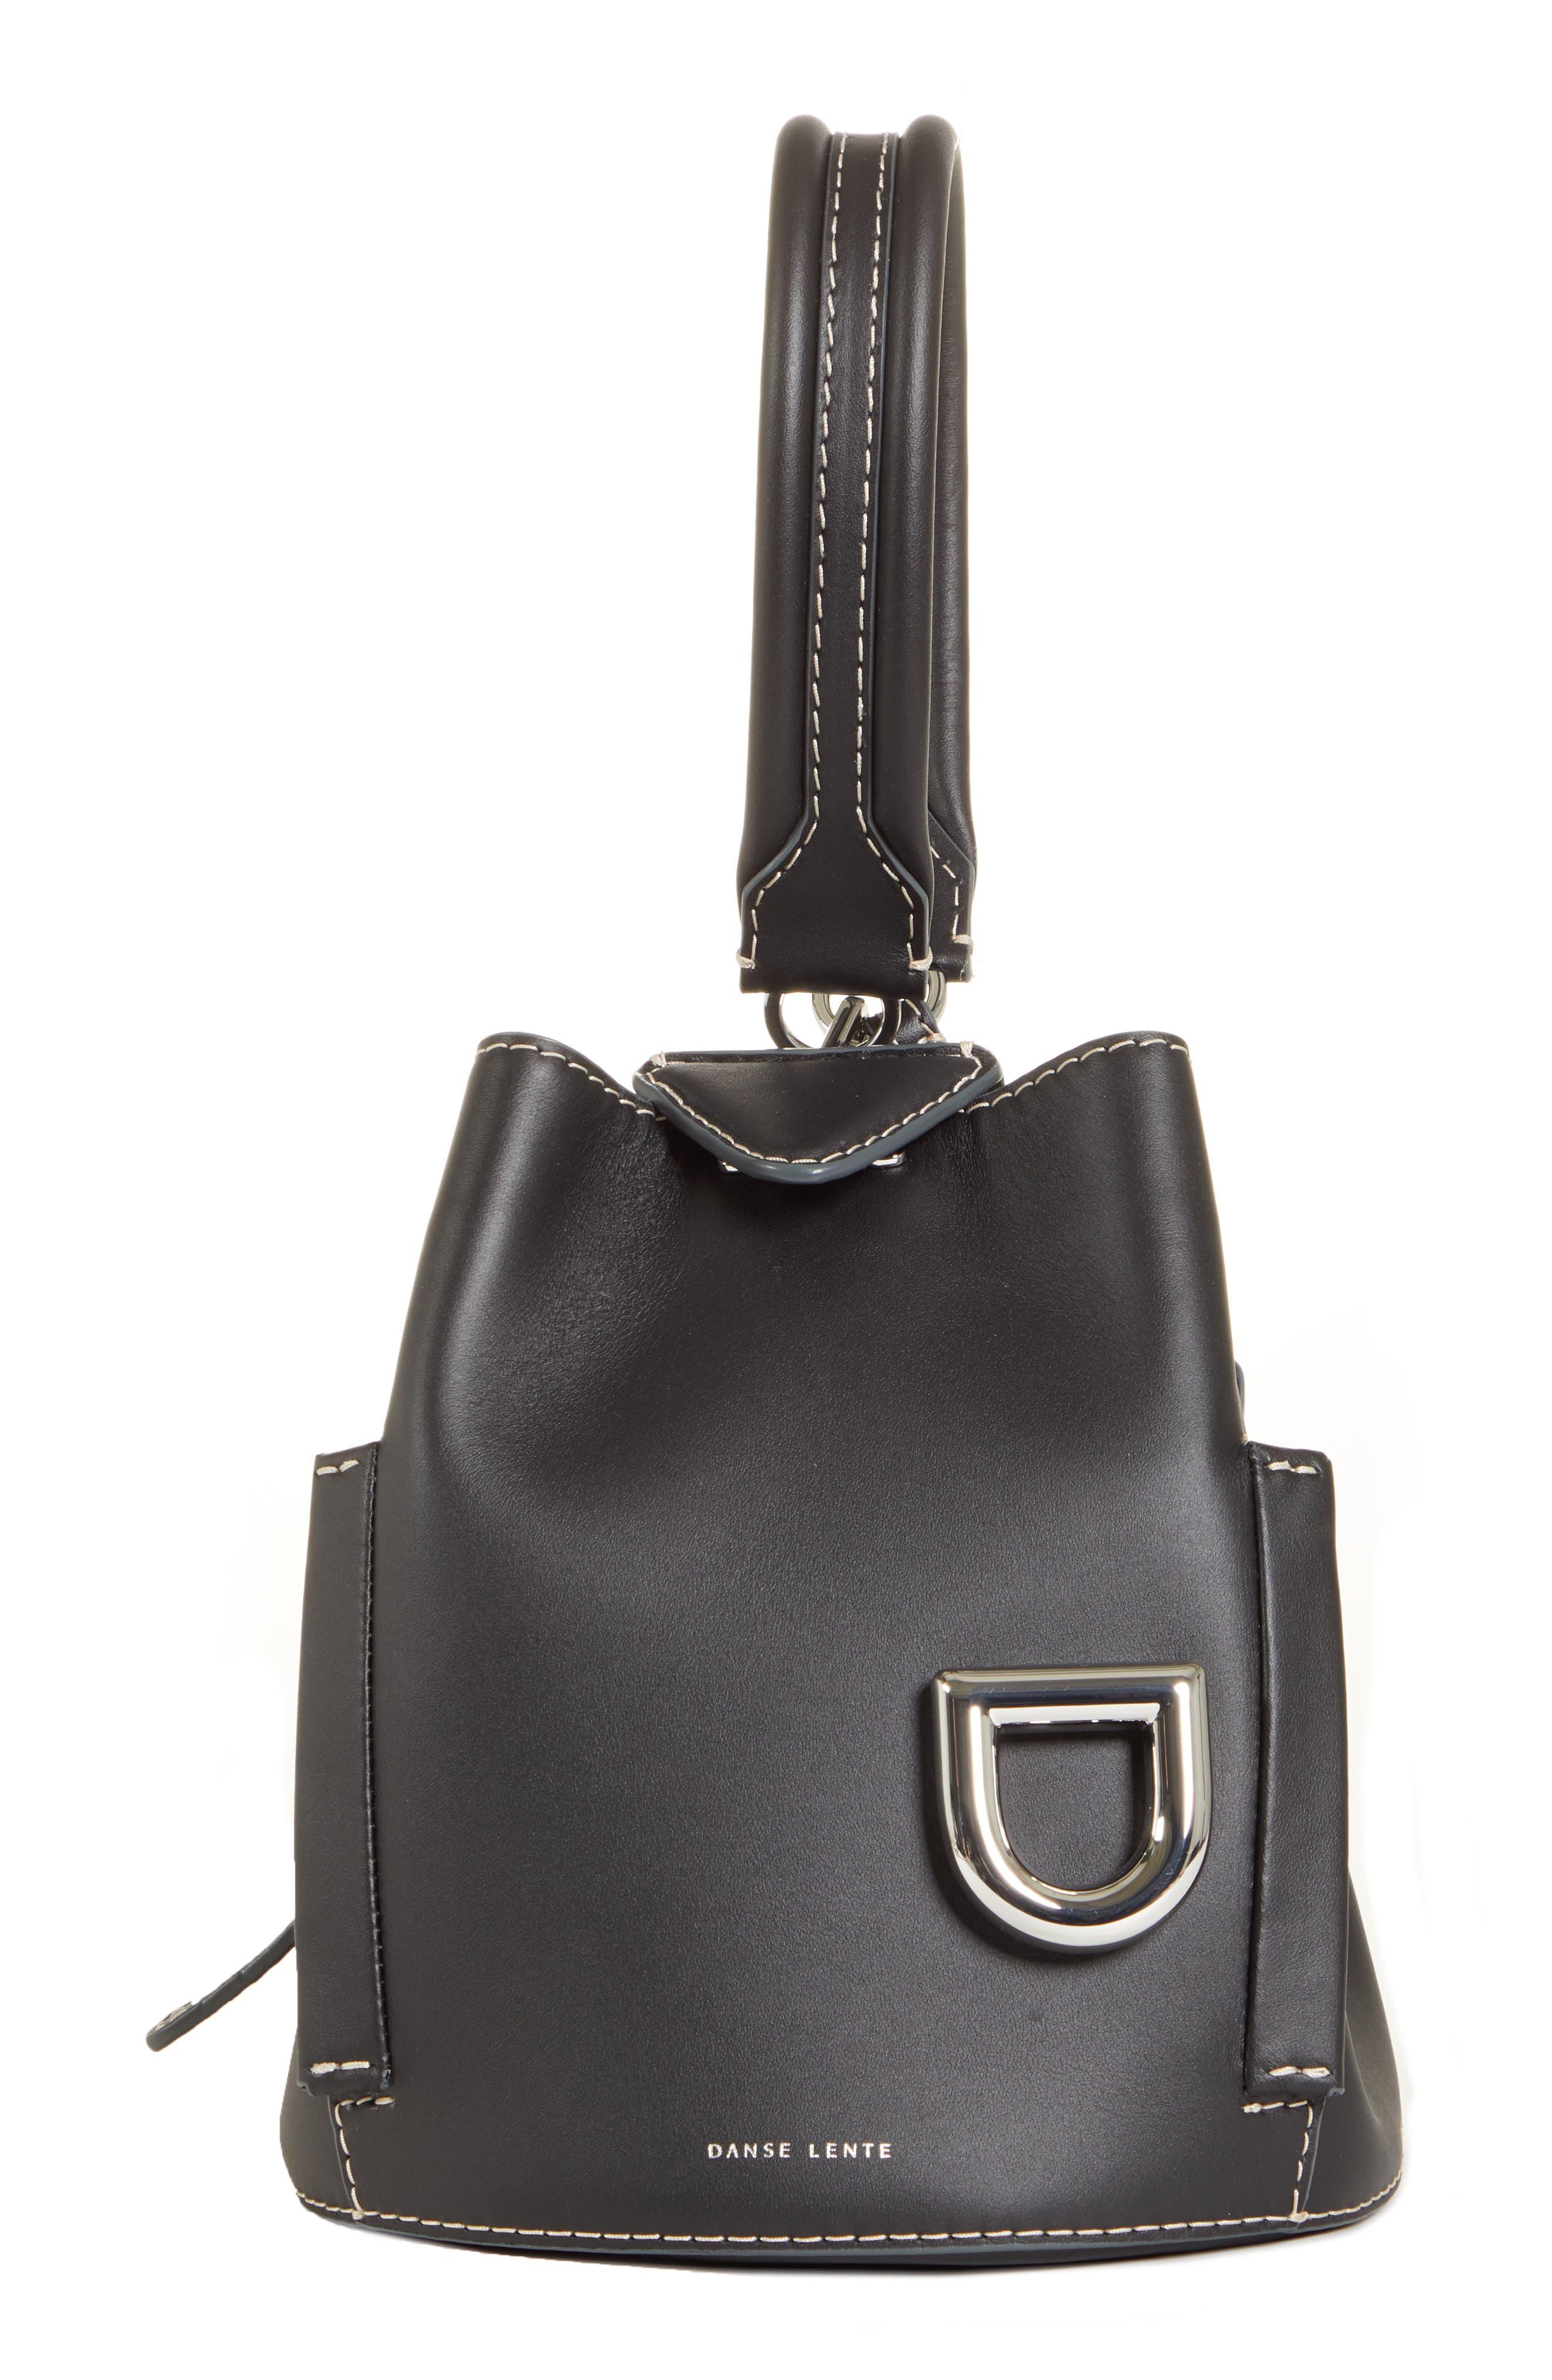 6e486e3fa Danse Lente Handbags & Wallets for Women | Nordstrom